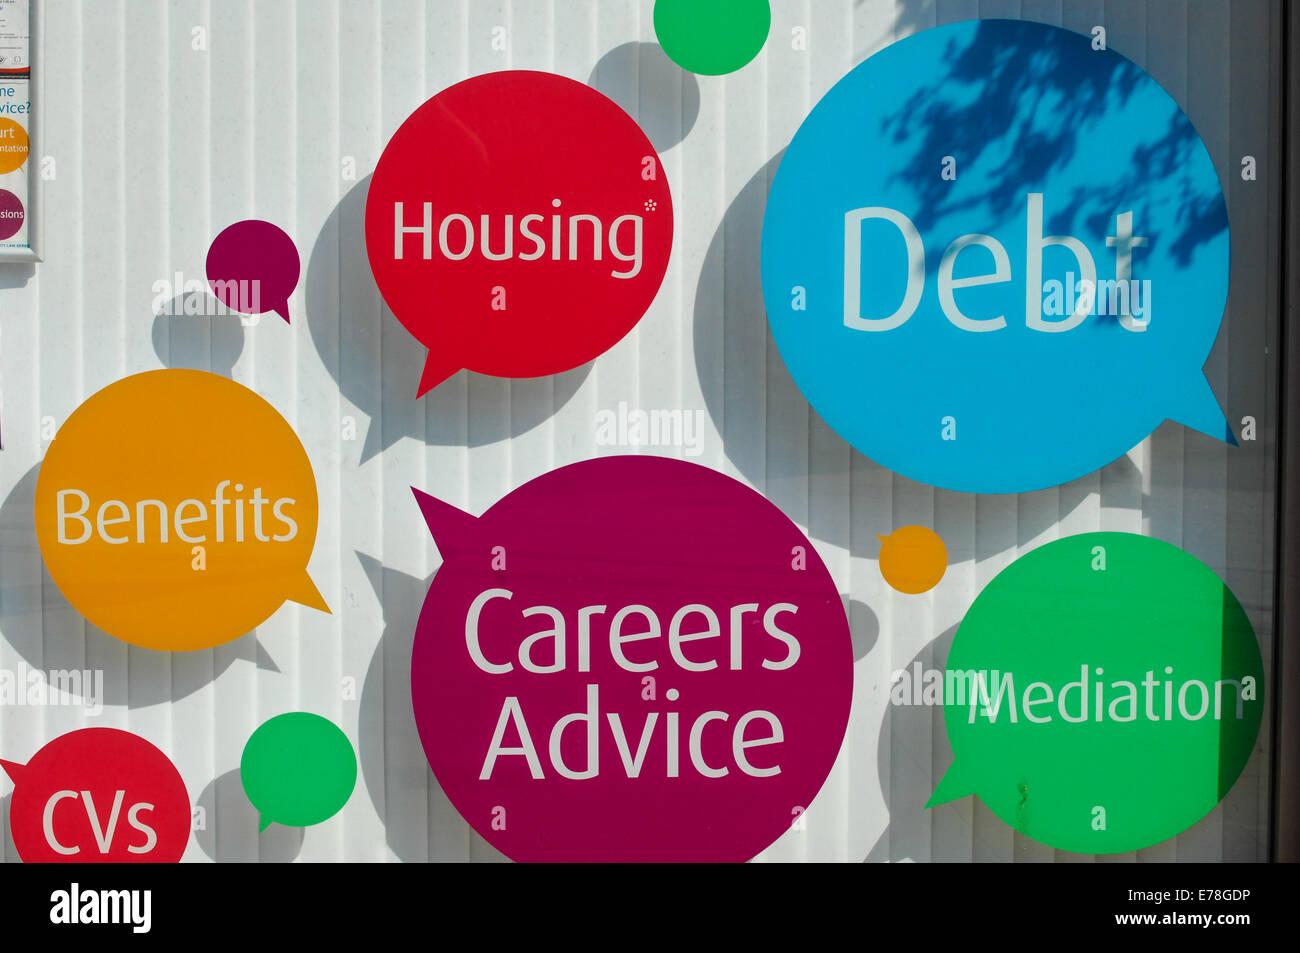 Citizens advice office shop - Stock Image